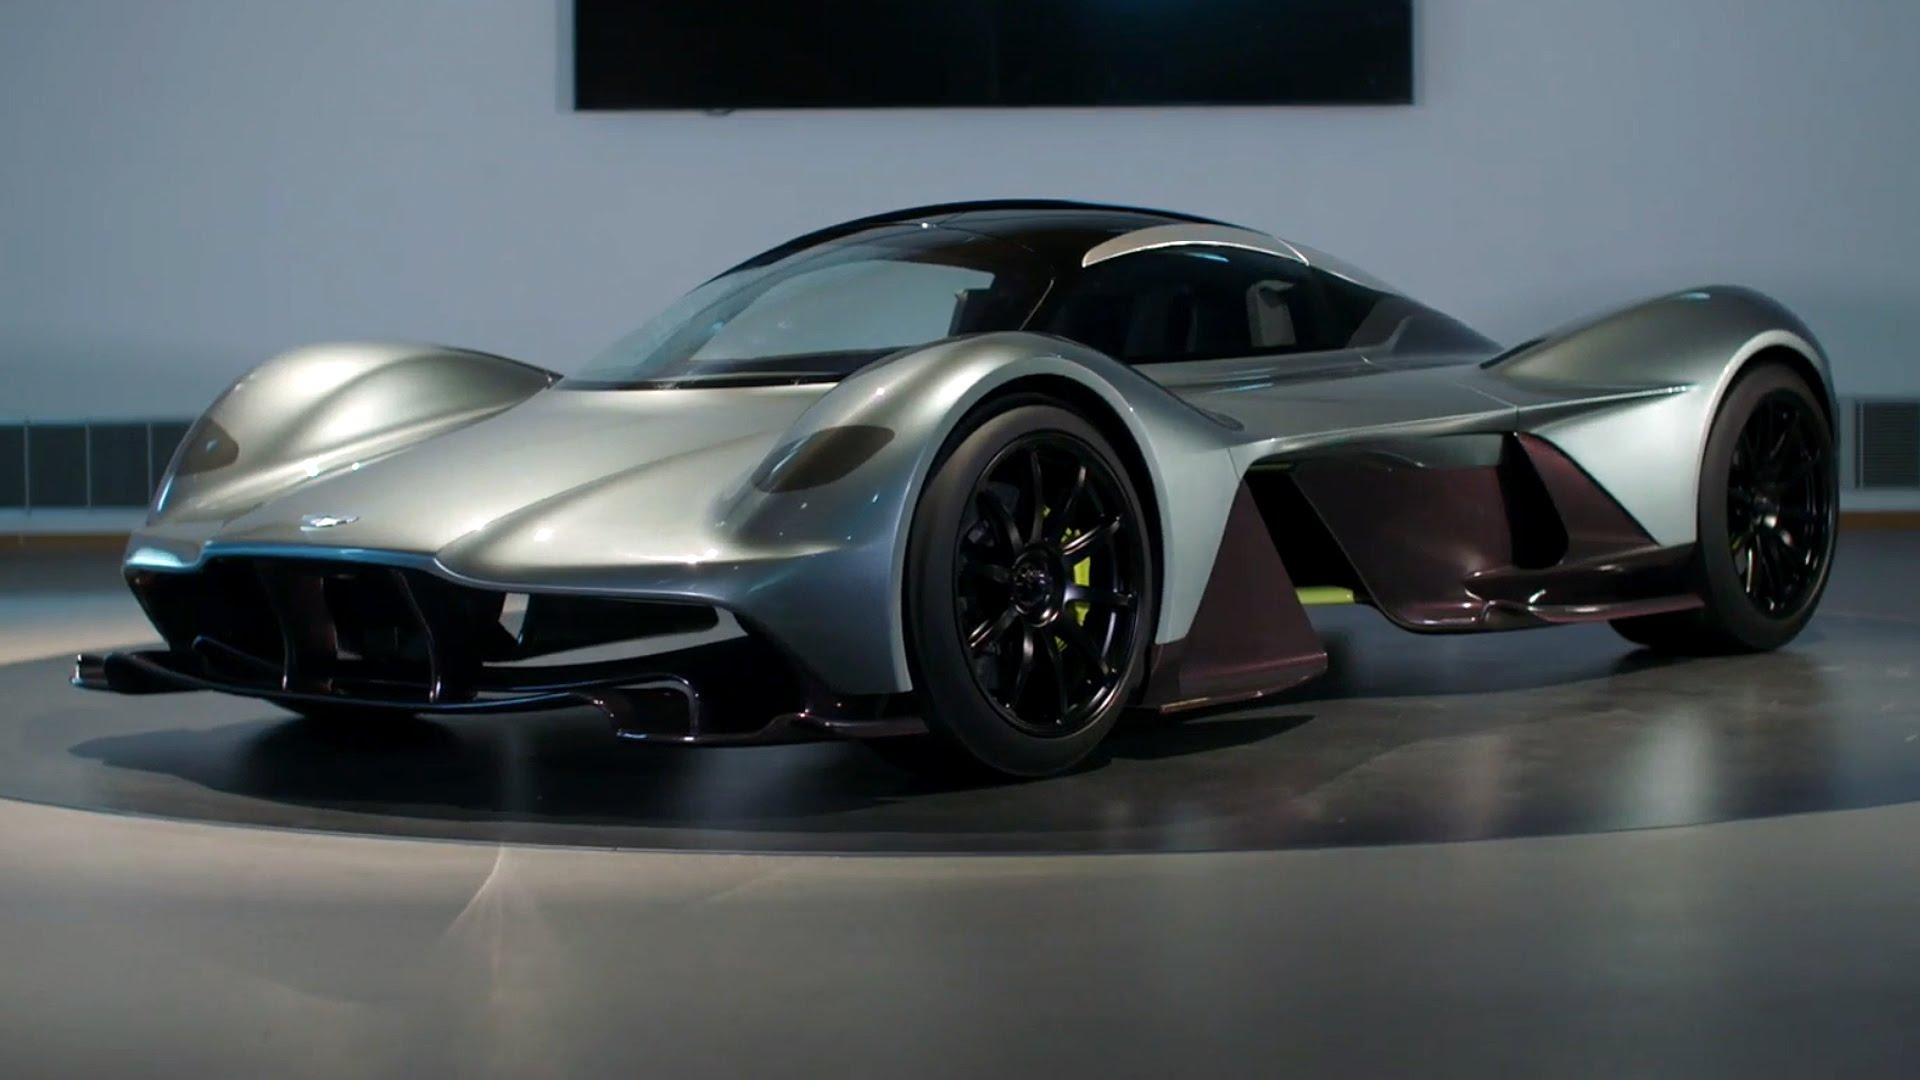 2018-Aston-Martin-AM-RB-001-